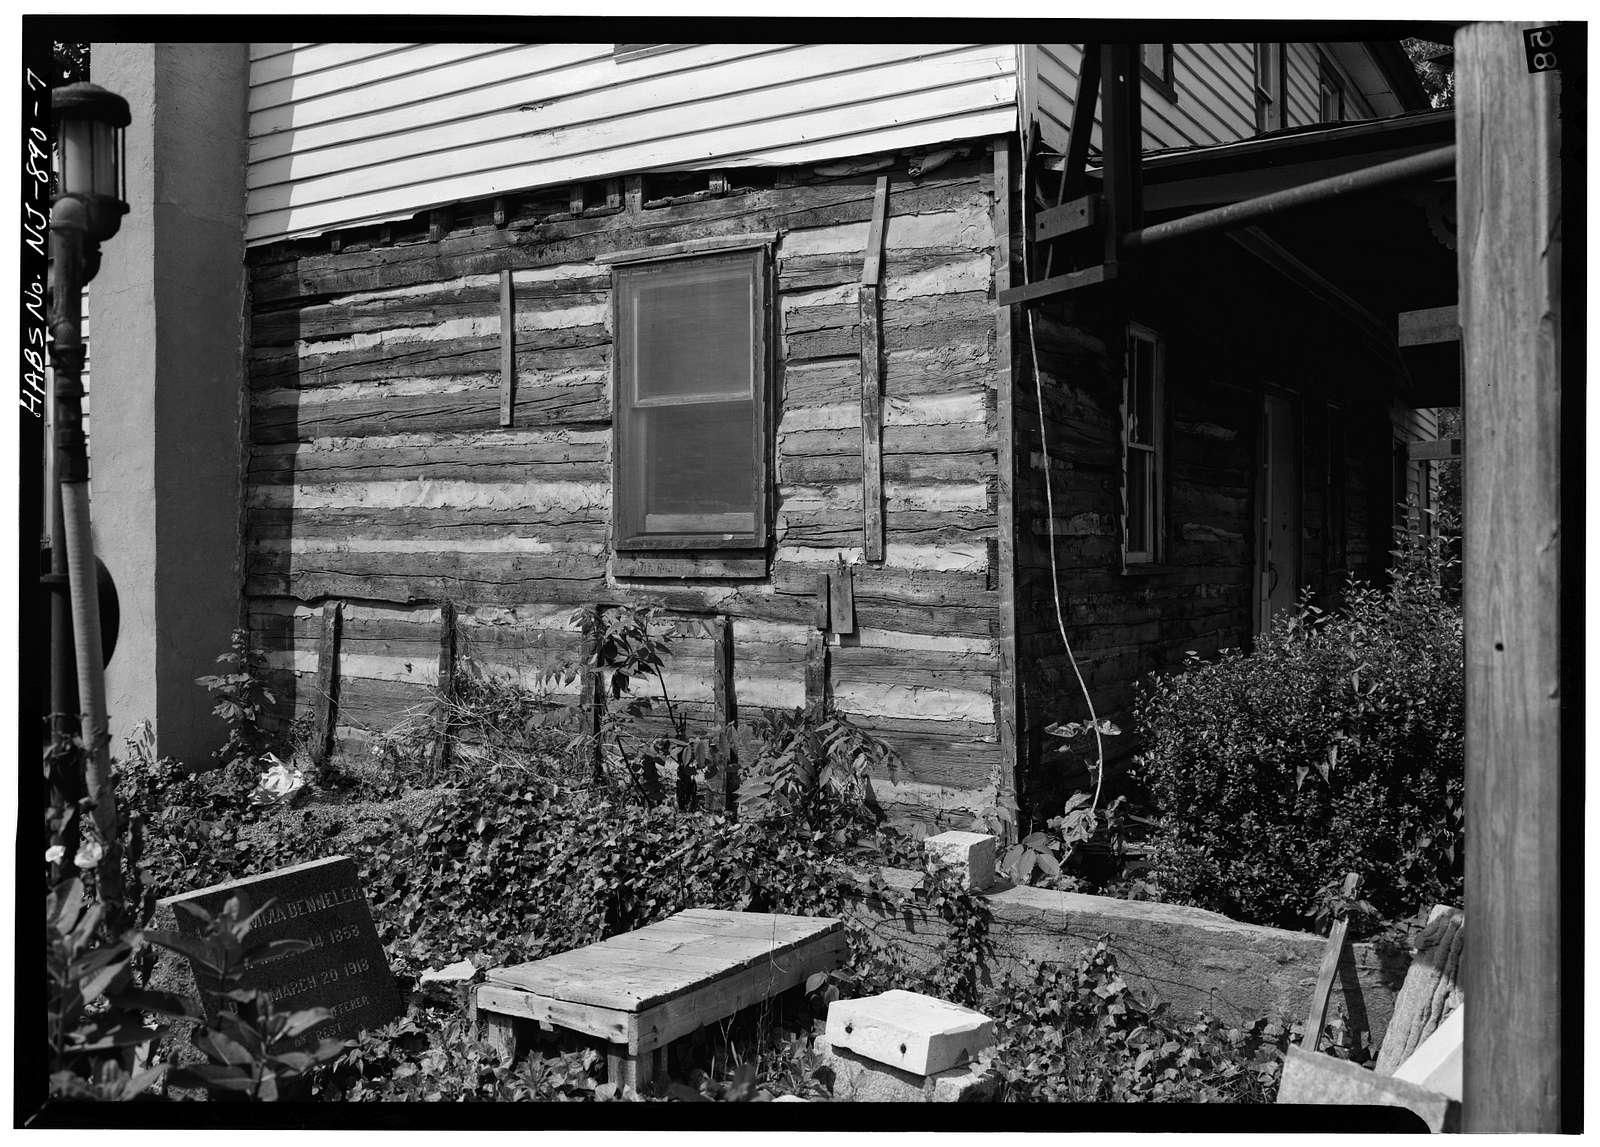 Shinn-Curtis Log Cabin, 23 Washington Street (moved from Rancocas Boulevard), Mount Holly, Burlington County, NJ